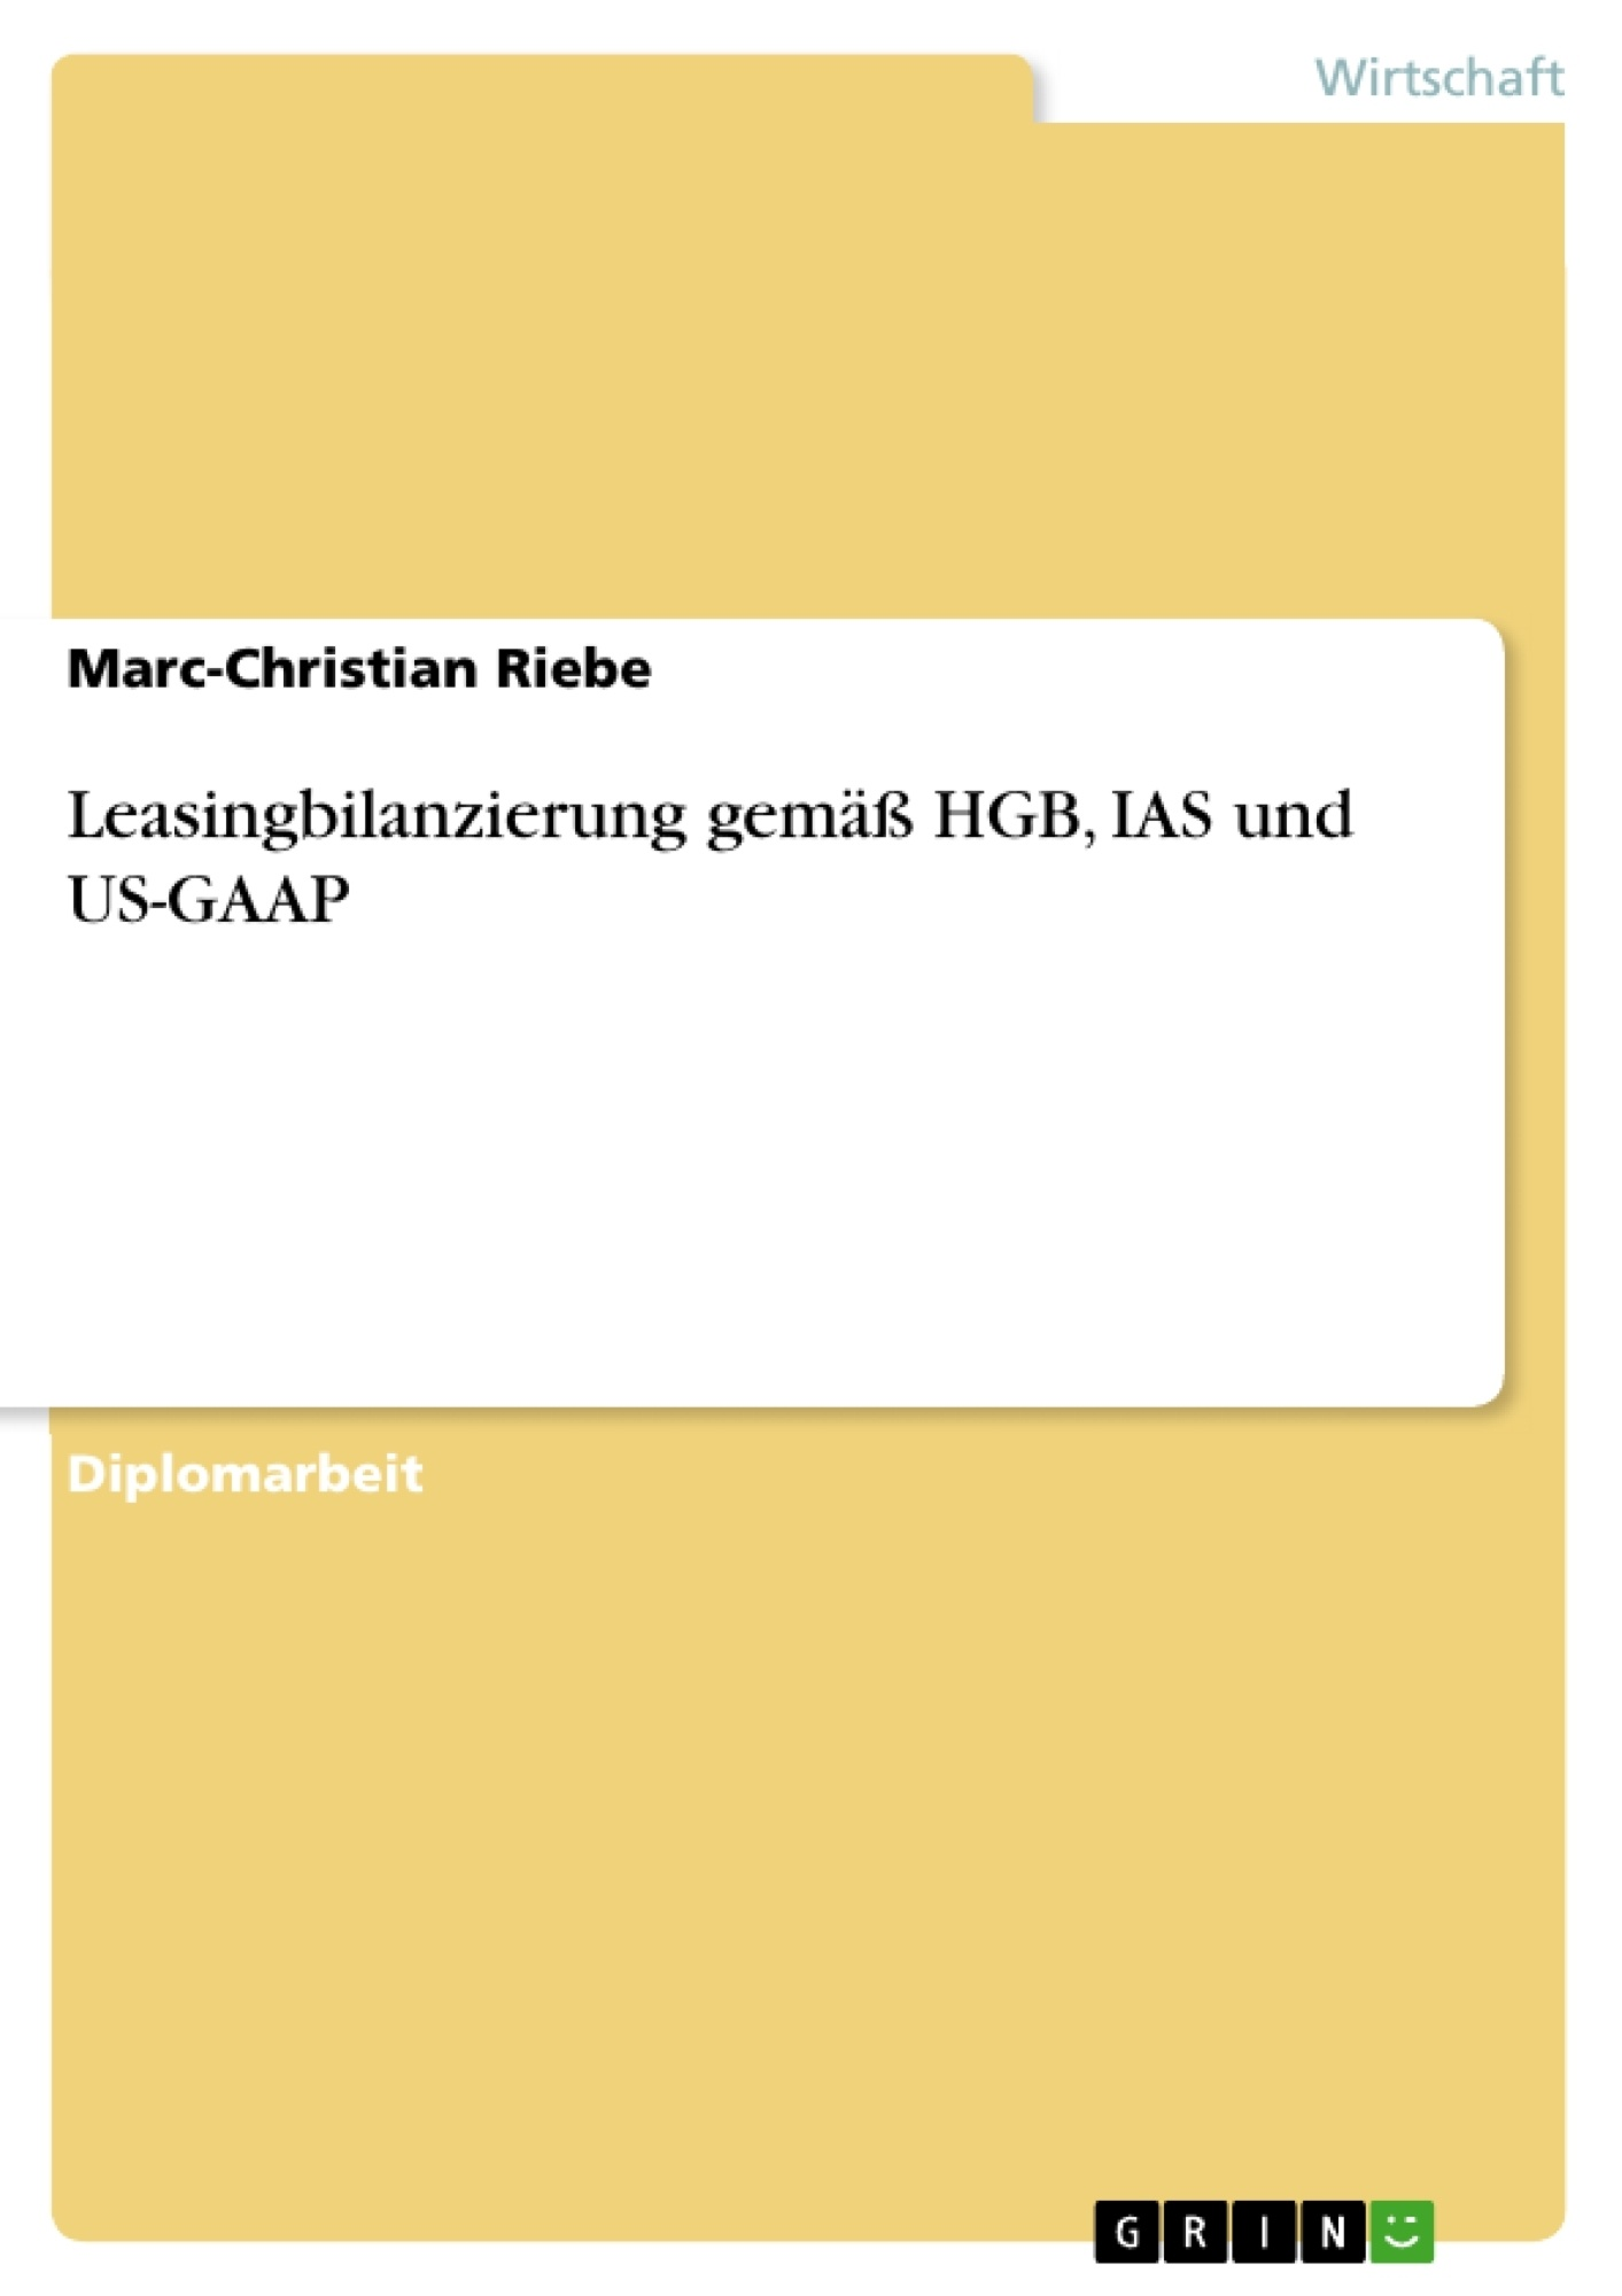 Titel: Leasingbilanzierung gemäß HGB, IAS und US-GAAP